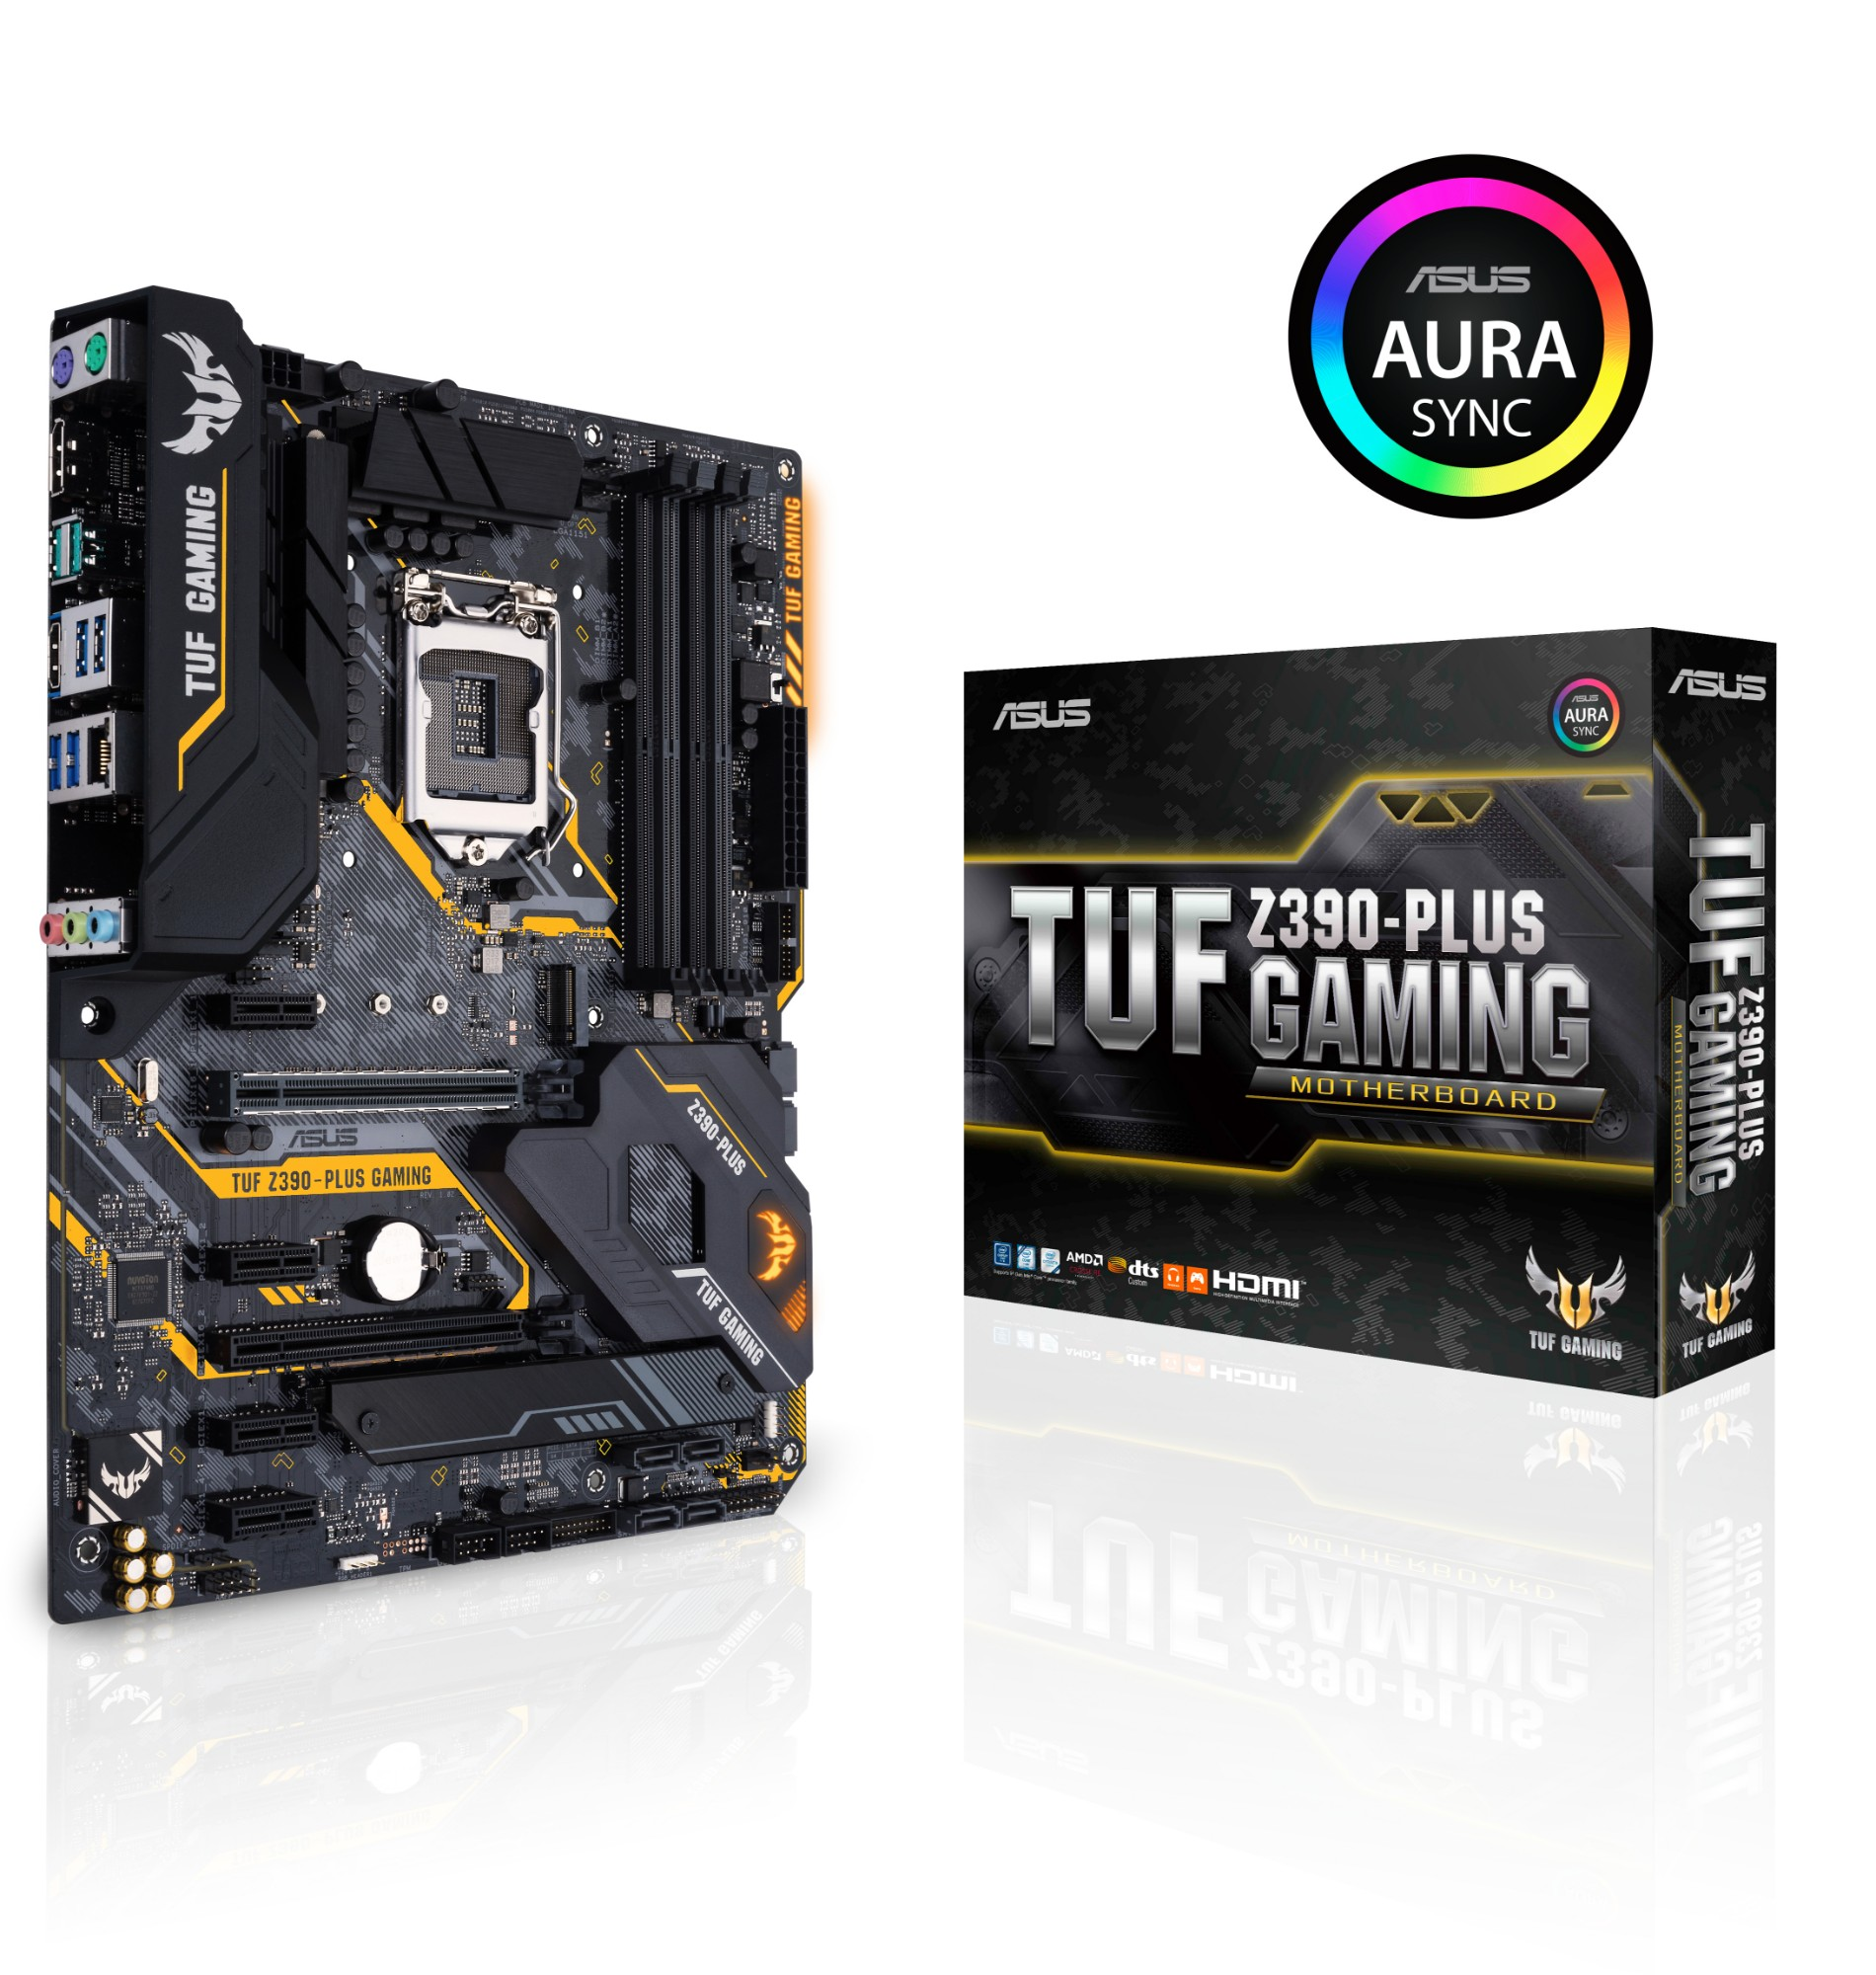 www CUSTOMPC ie - ASUS TUF Z390-PLUS GAMING motherboard LGA